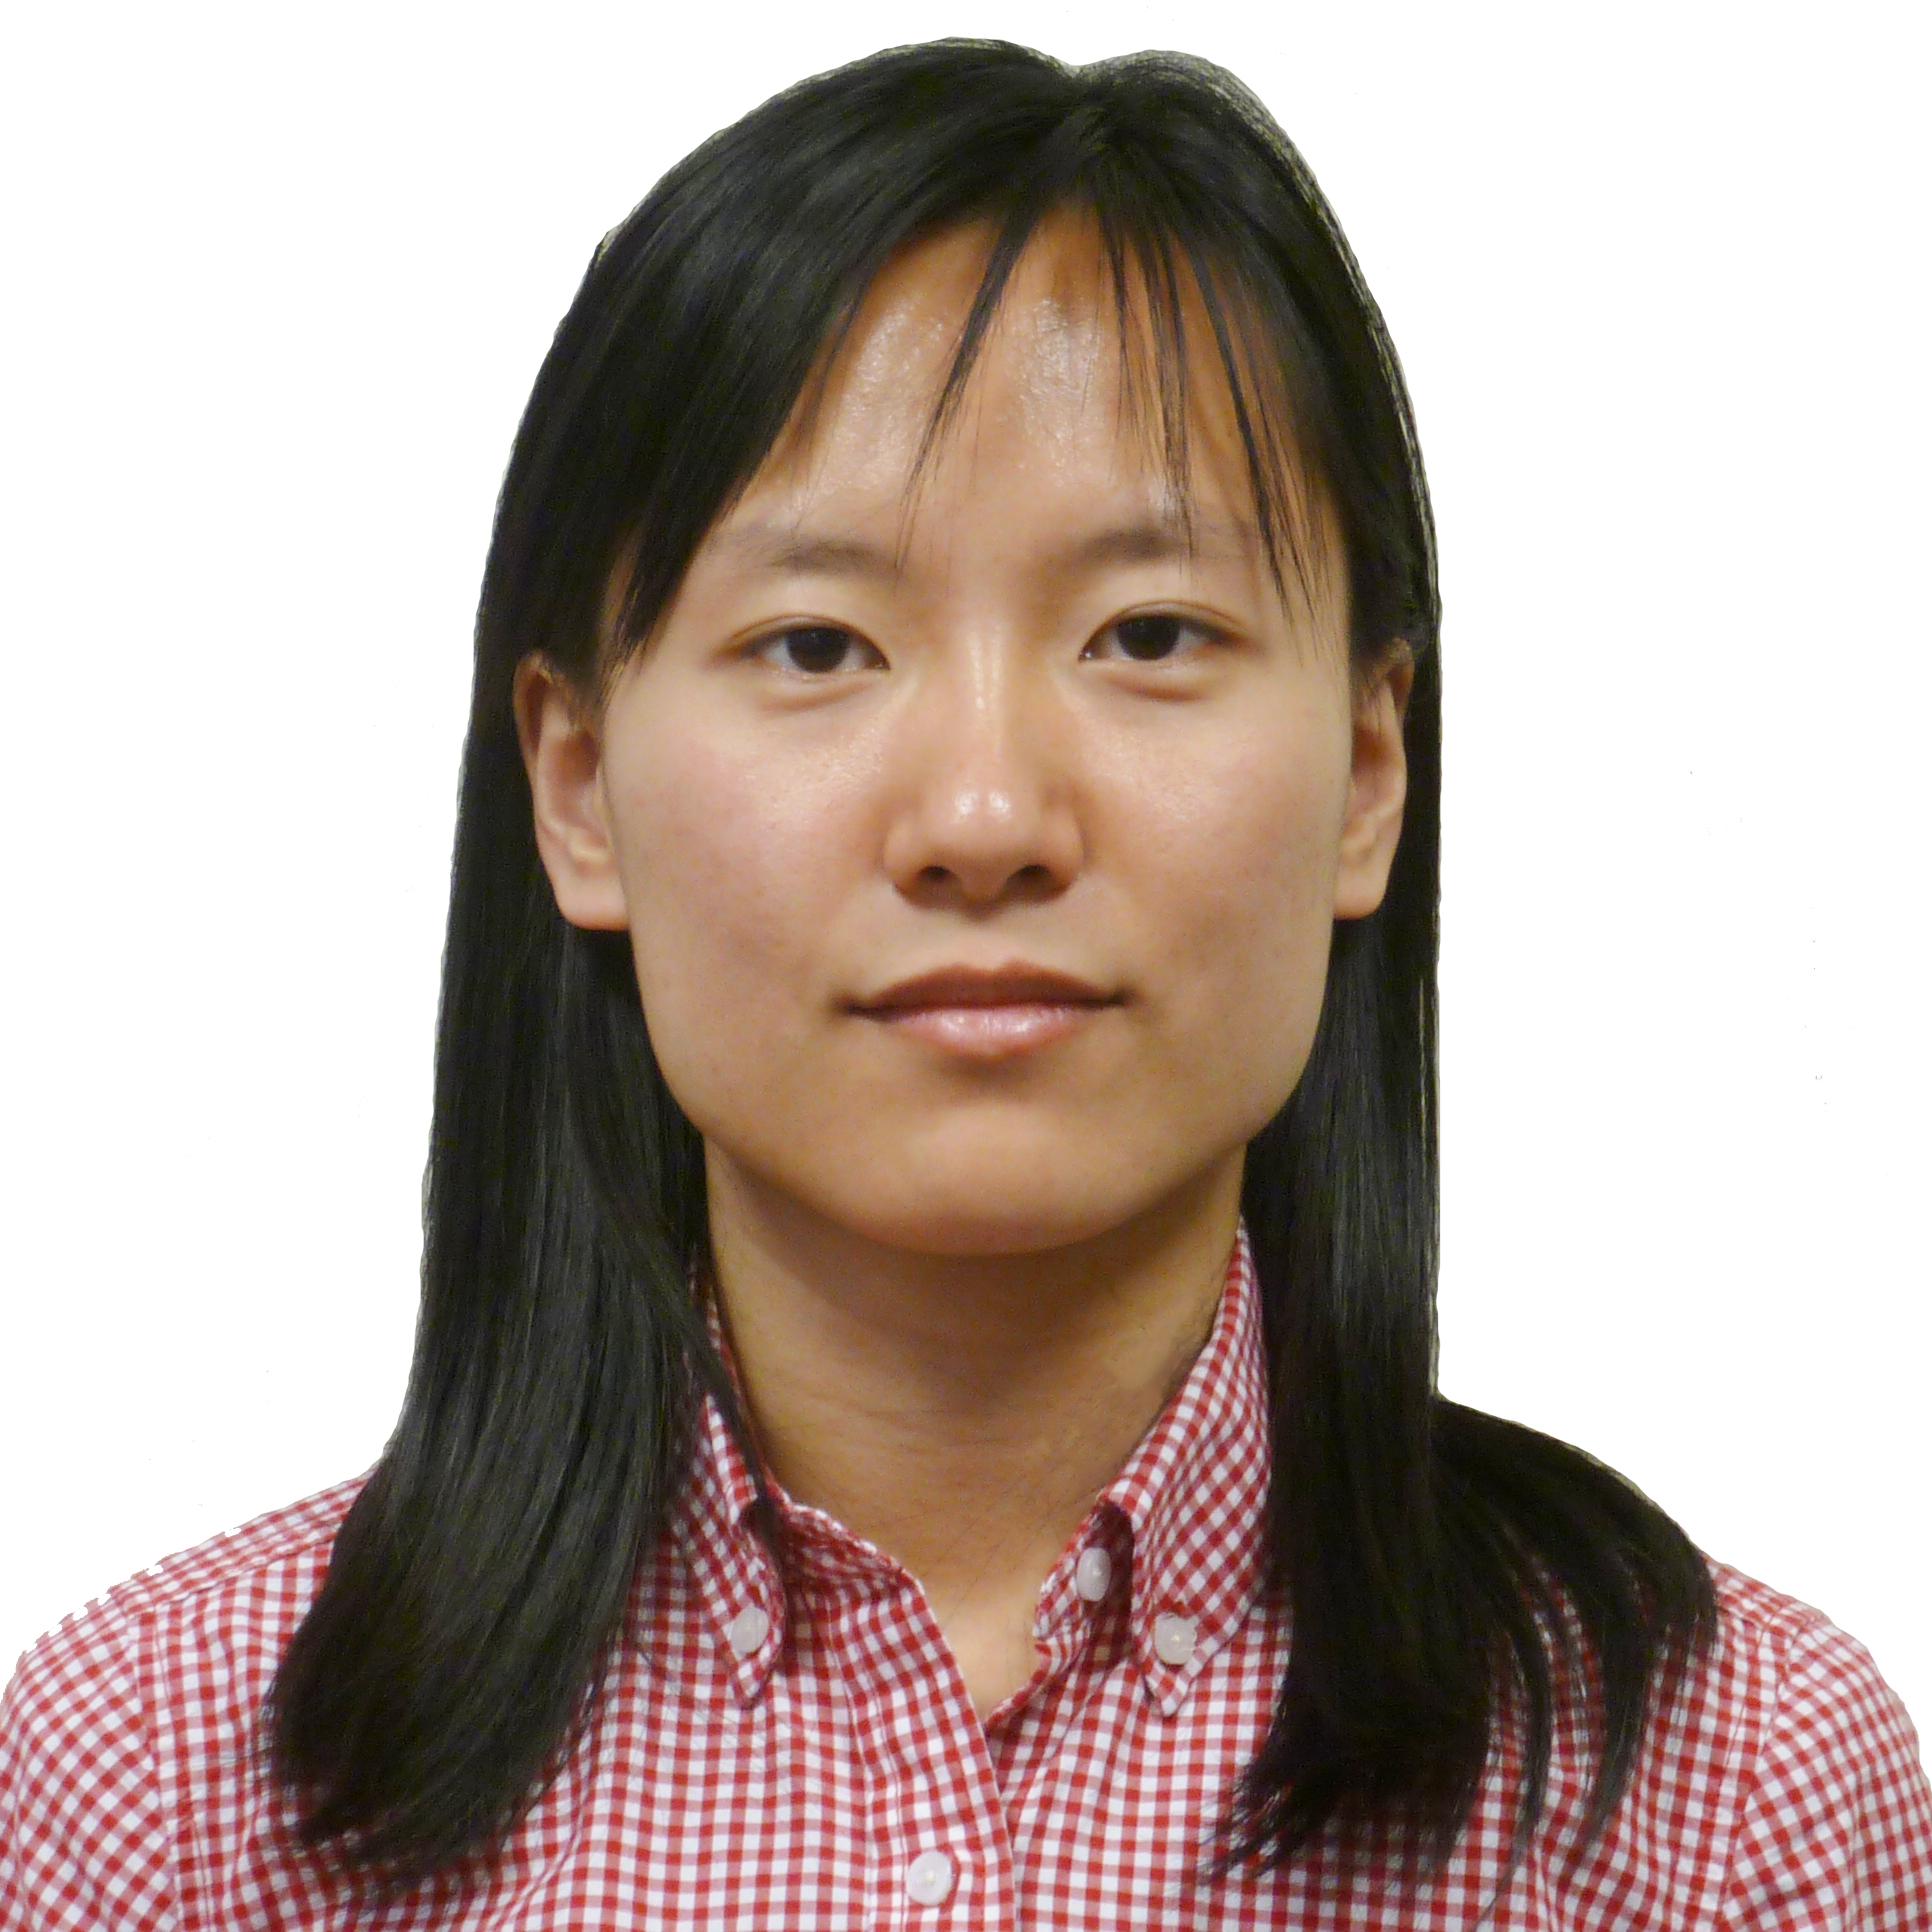 Portrait image for Yi Yan.